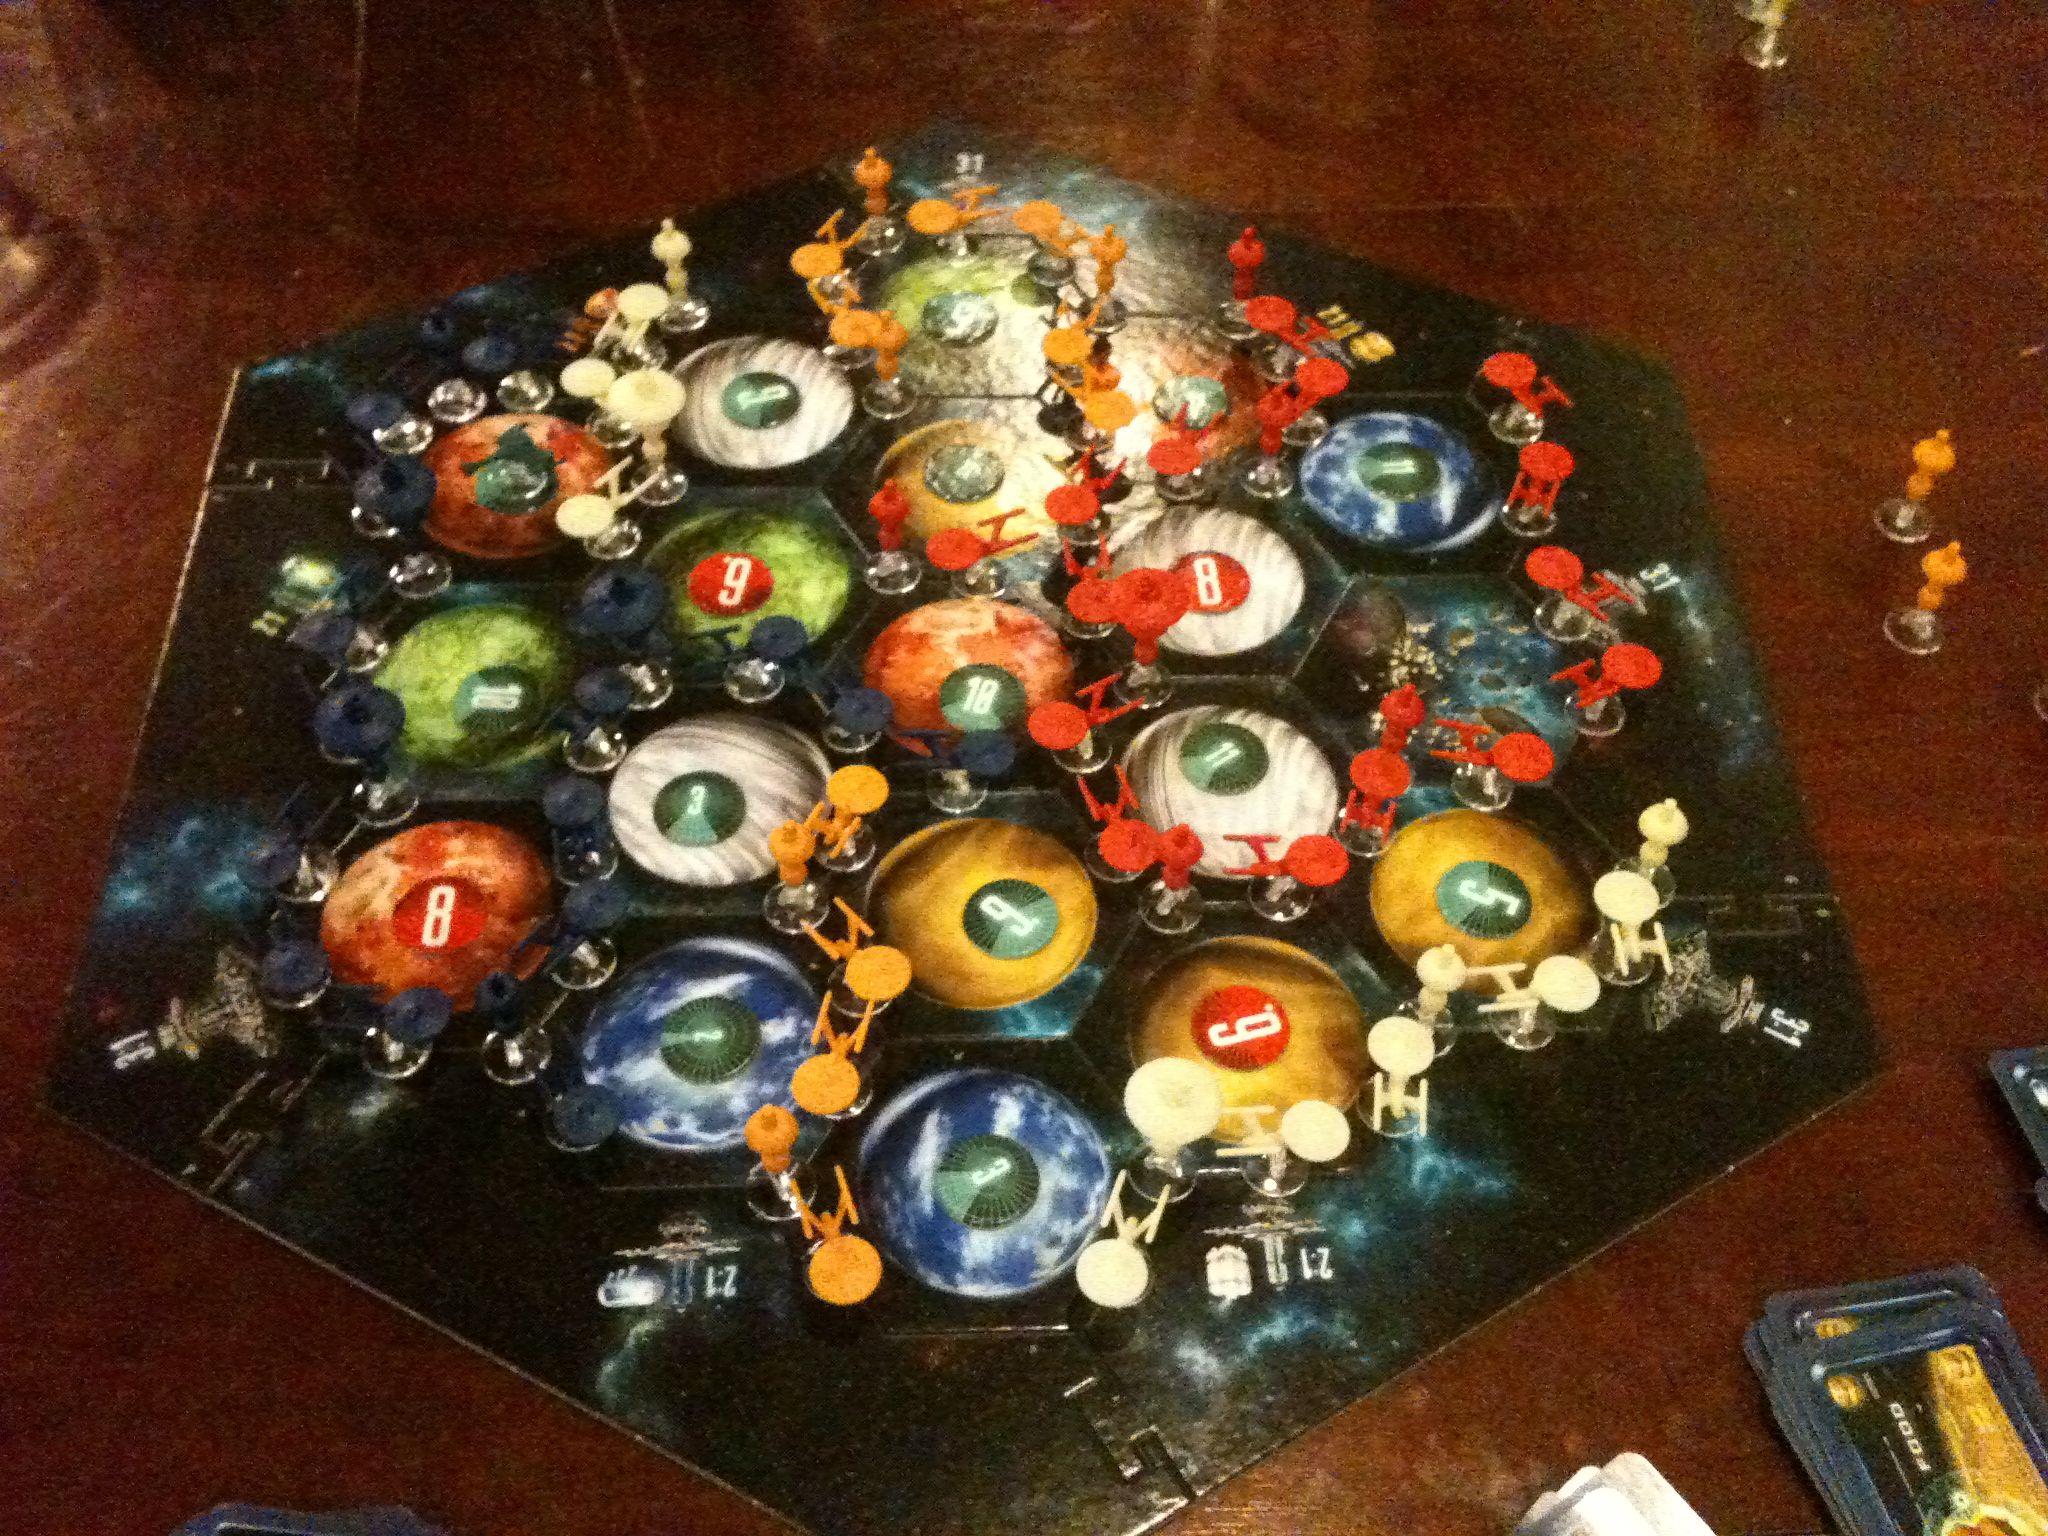 Star Trek Catan Set Up. Fun board games, Catan, Settlers